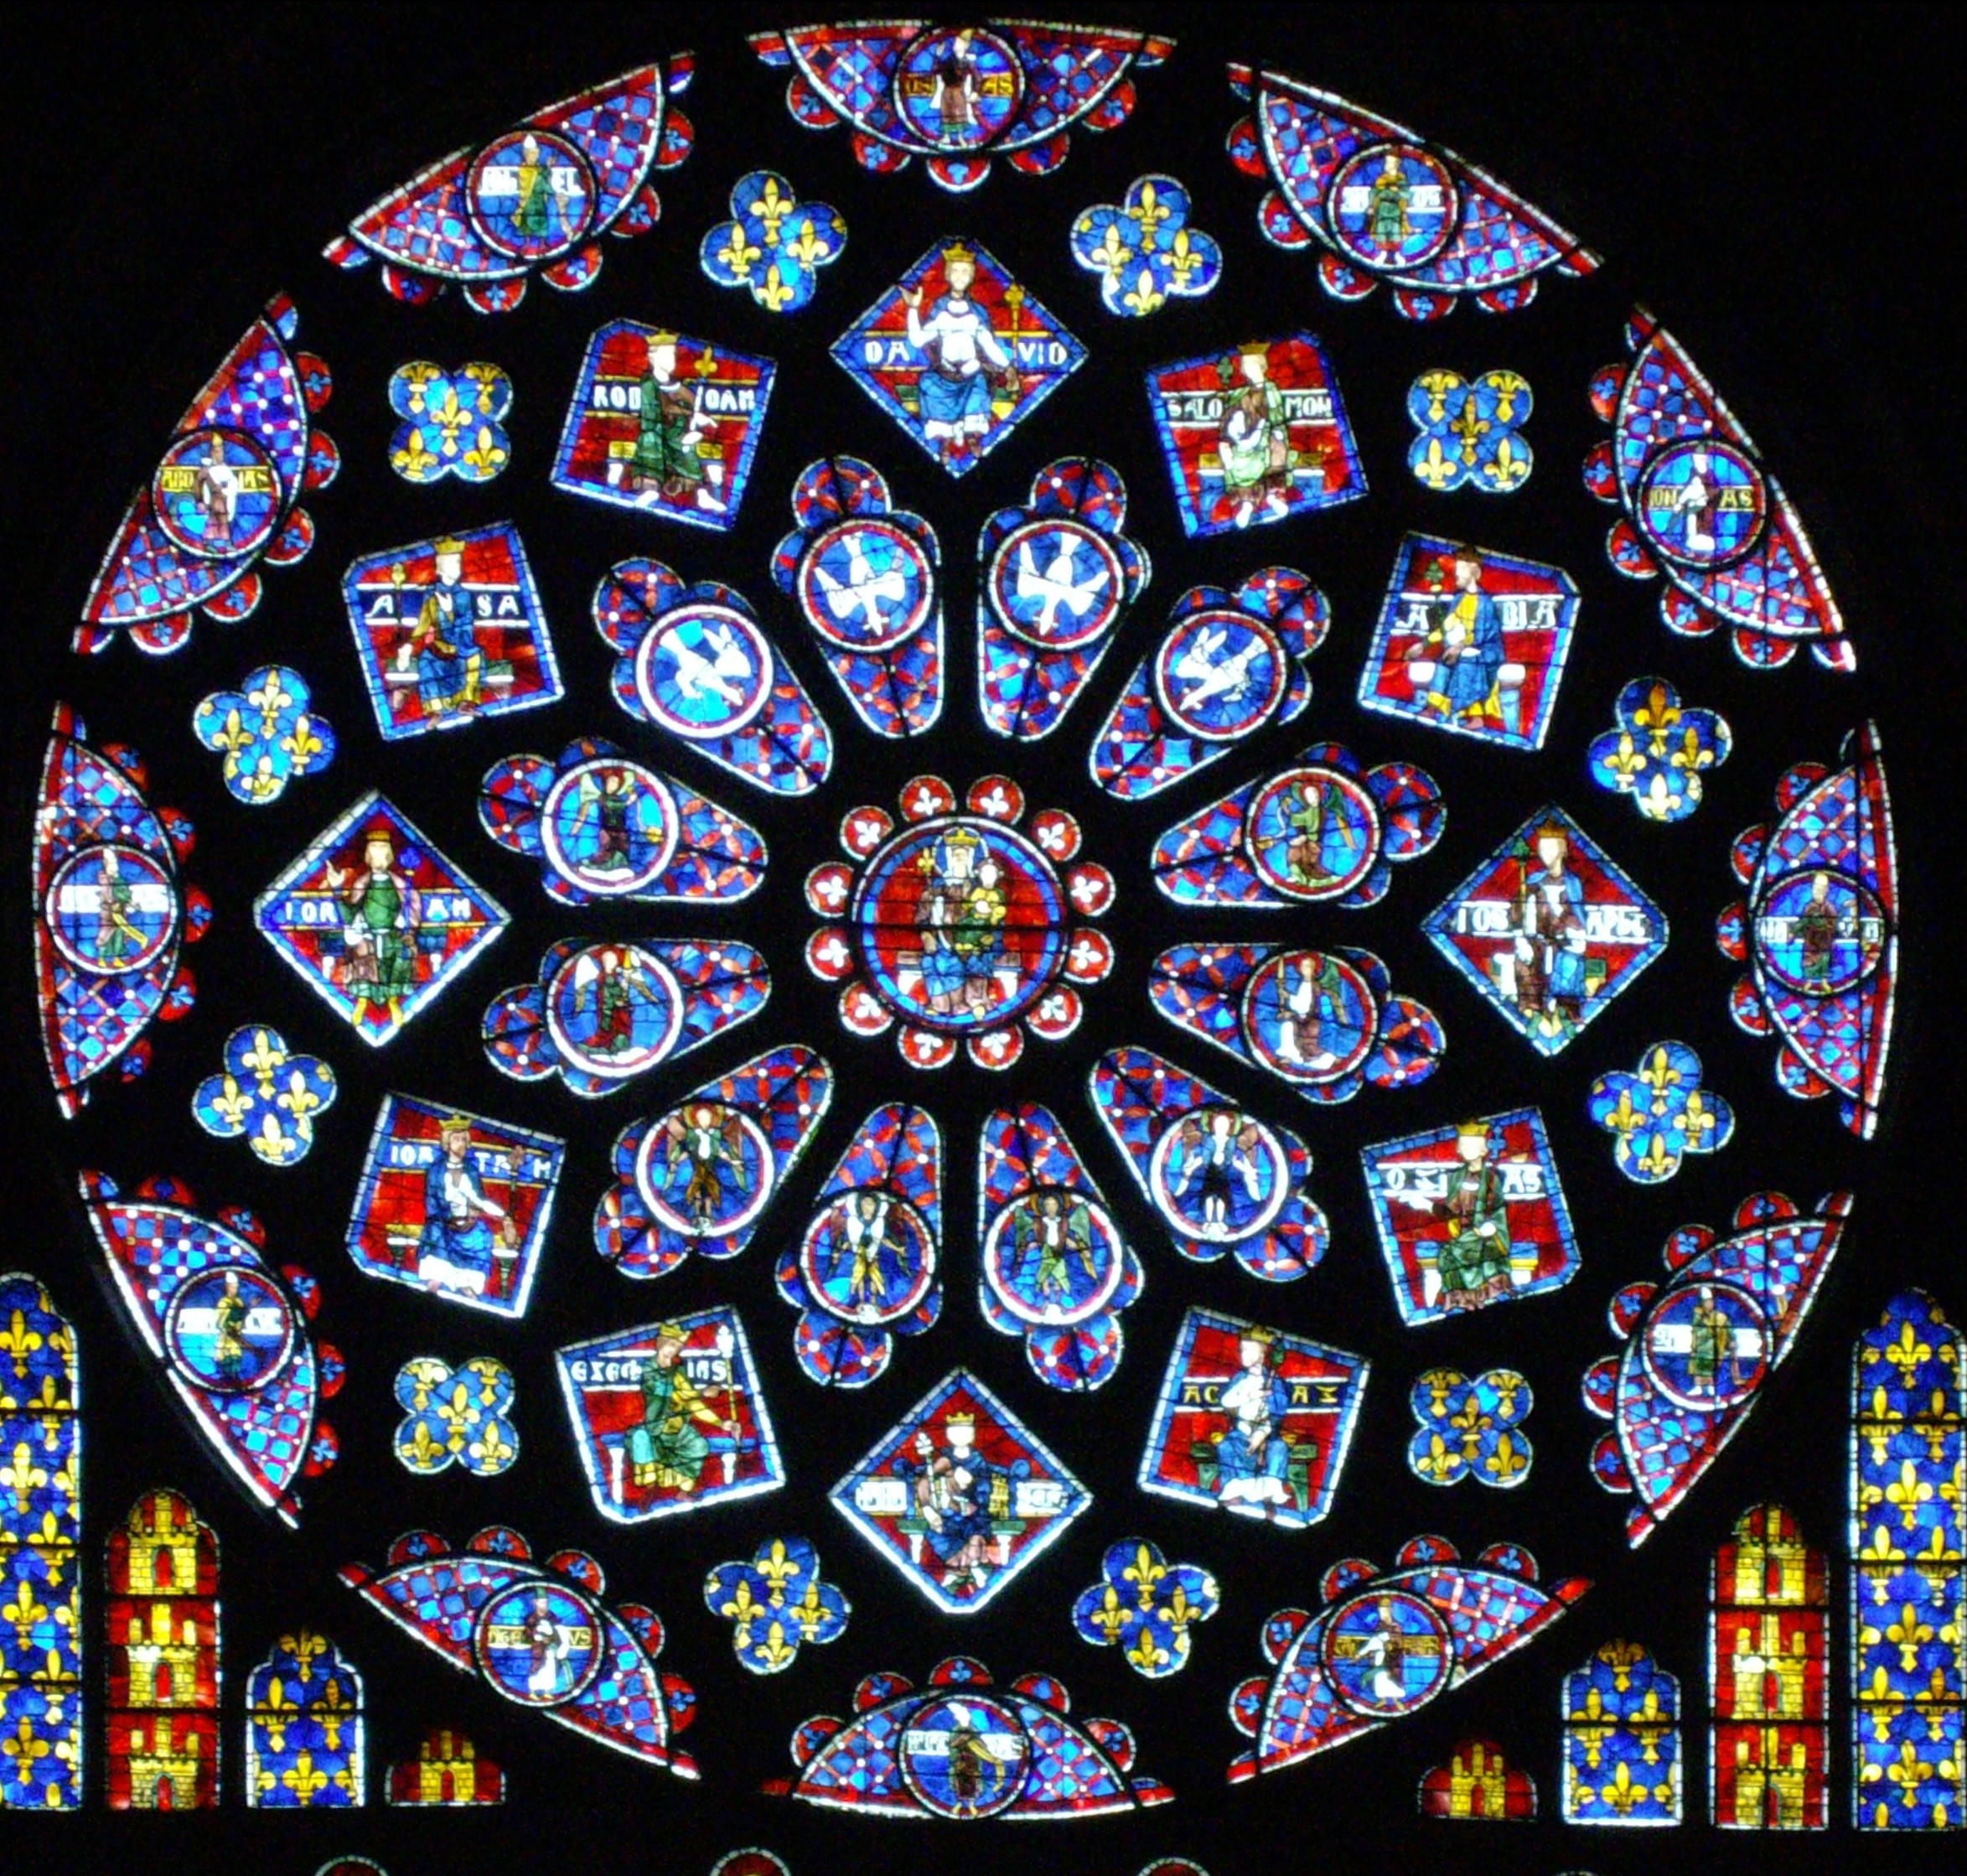 Gantt Chart Template: Cattedrale di Chartres - Wikipedia,Chart